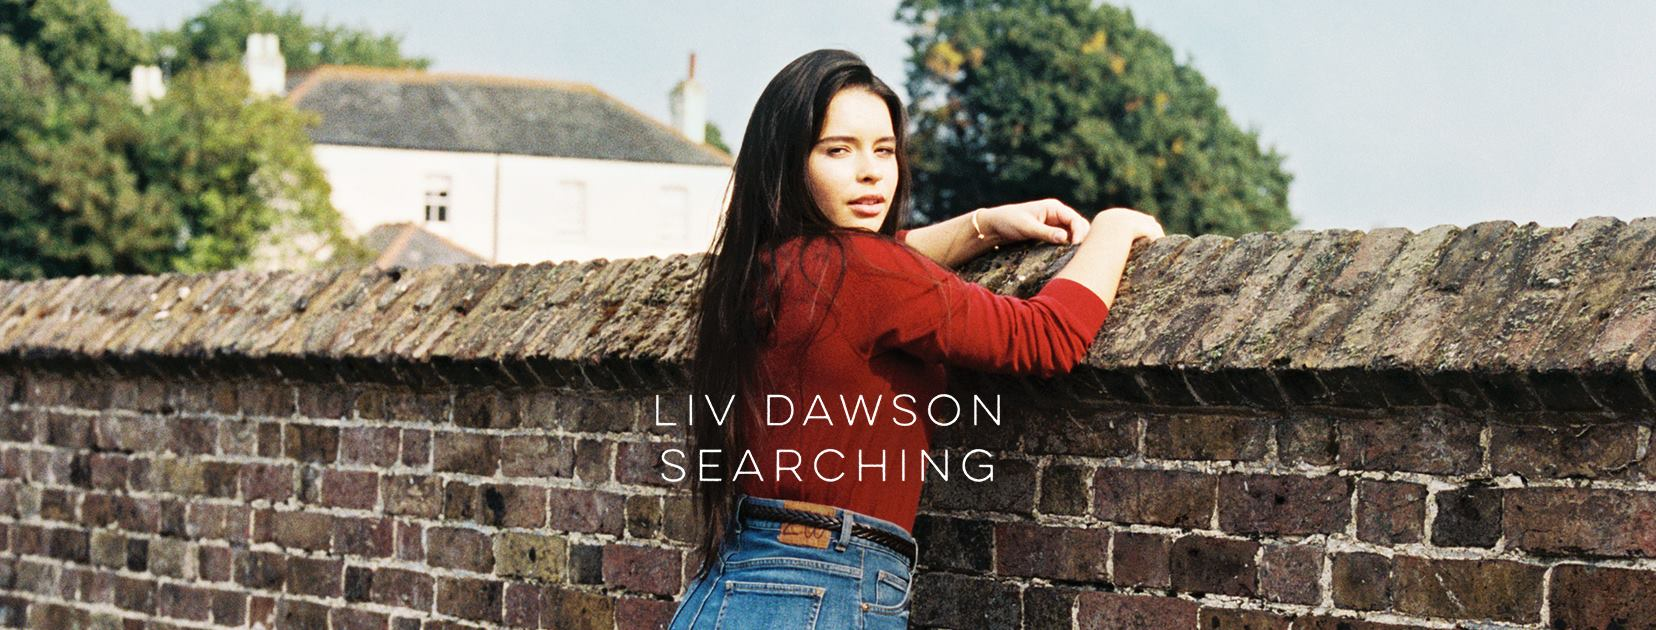 Liv Dawson JustMusic.fr